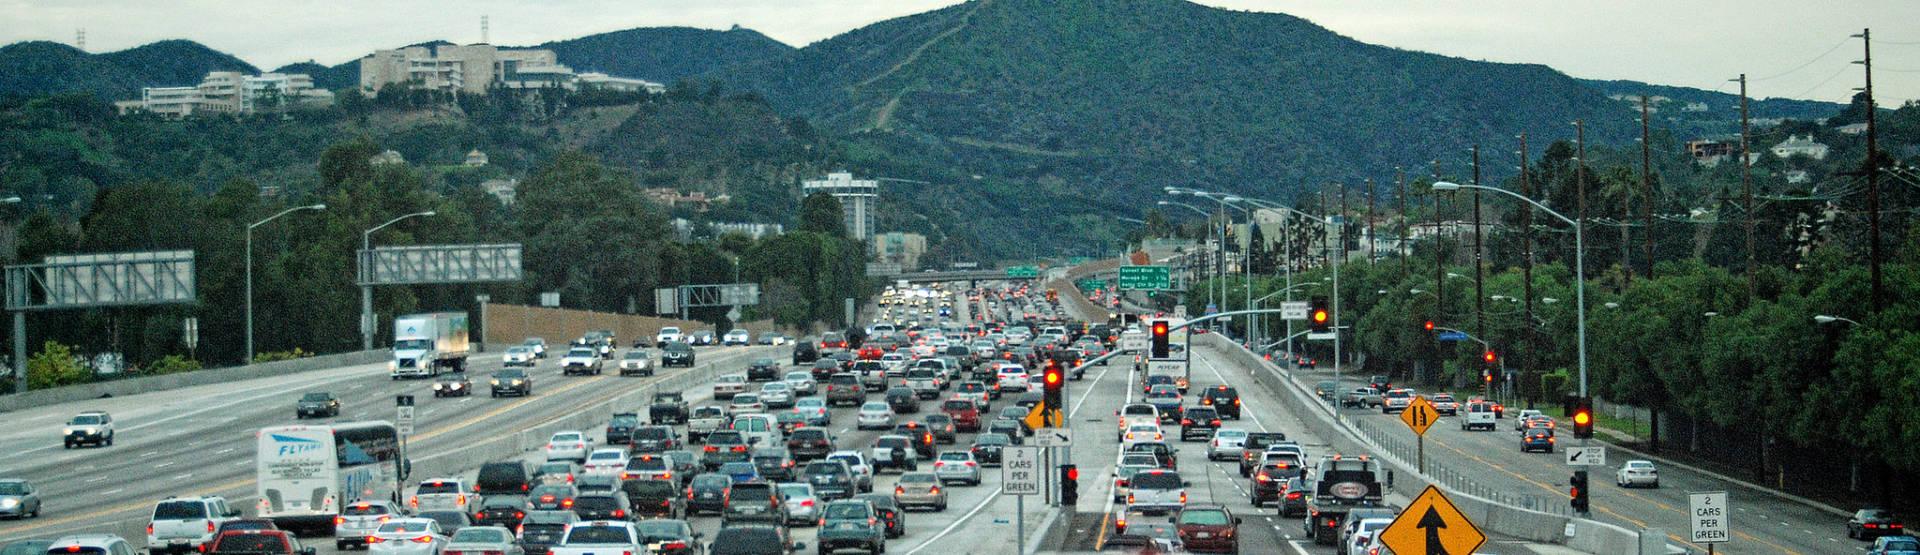 A heavy traffic jam.